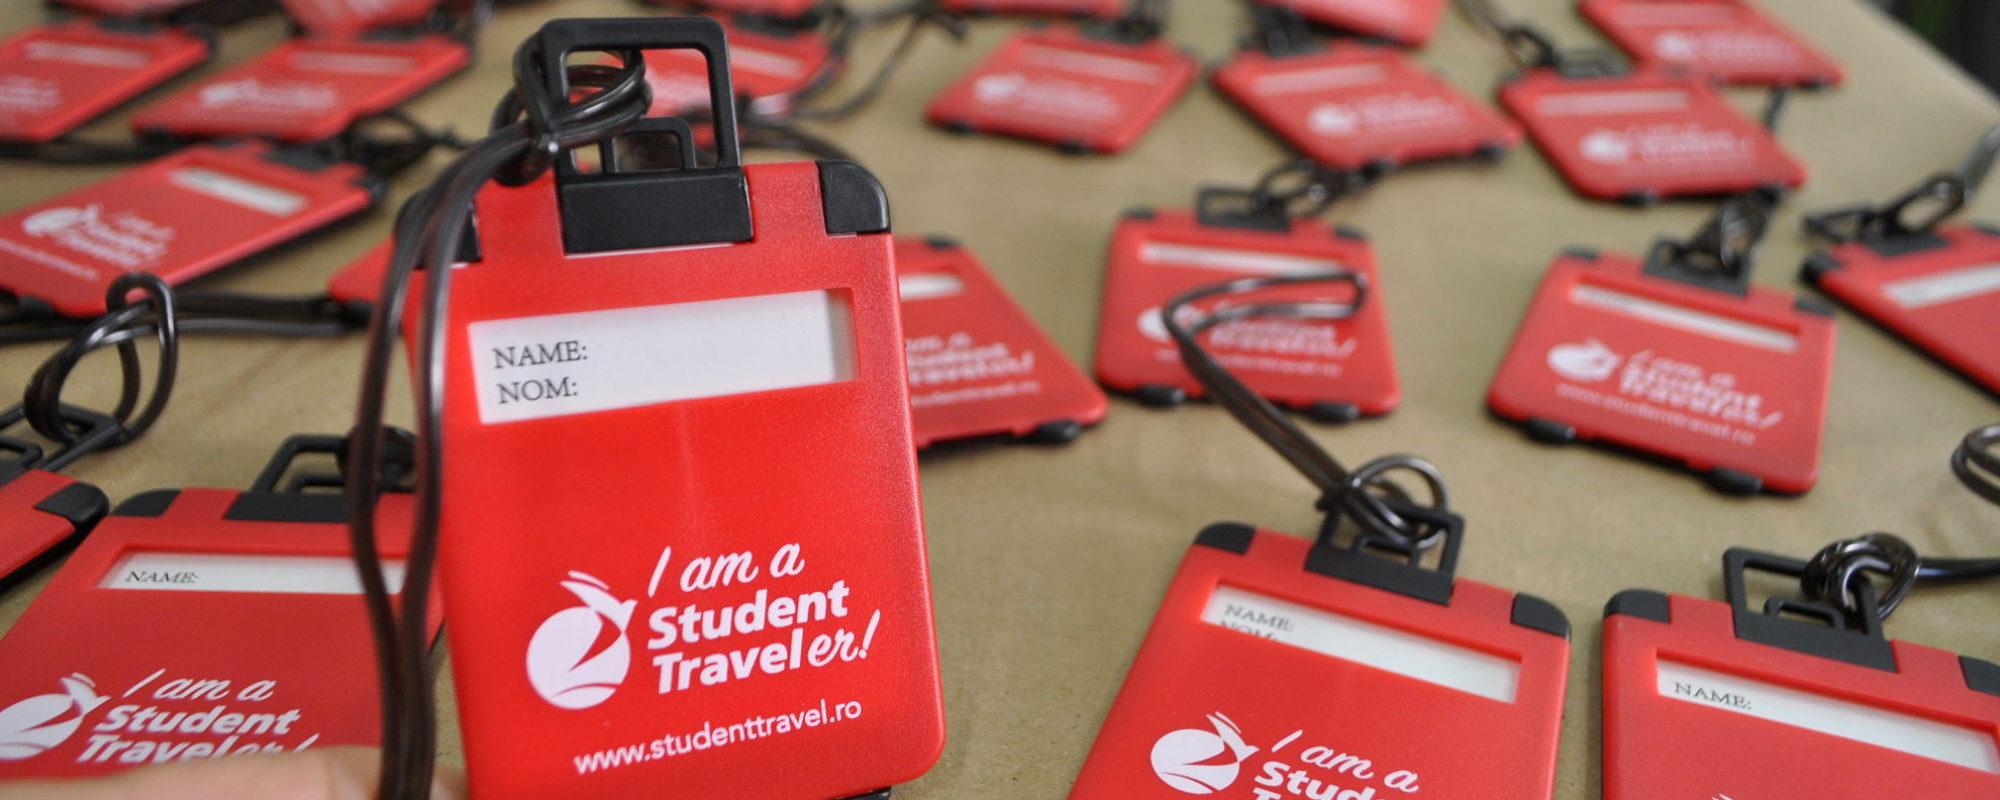 Serigrafie, Student travel, Pma Invest